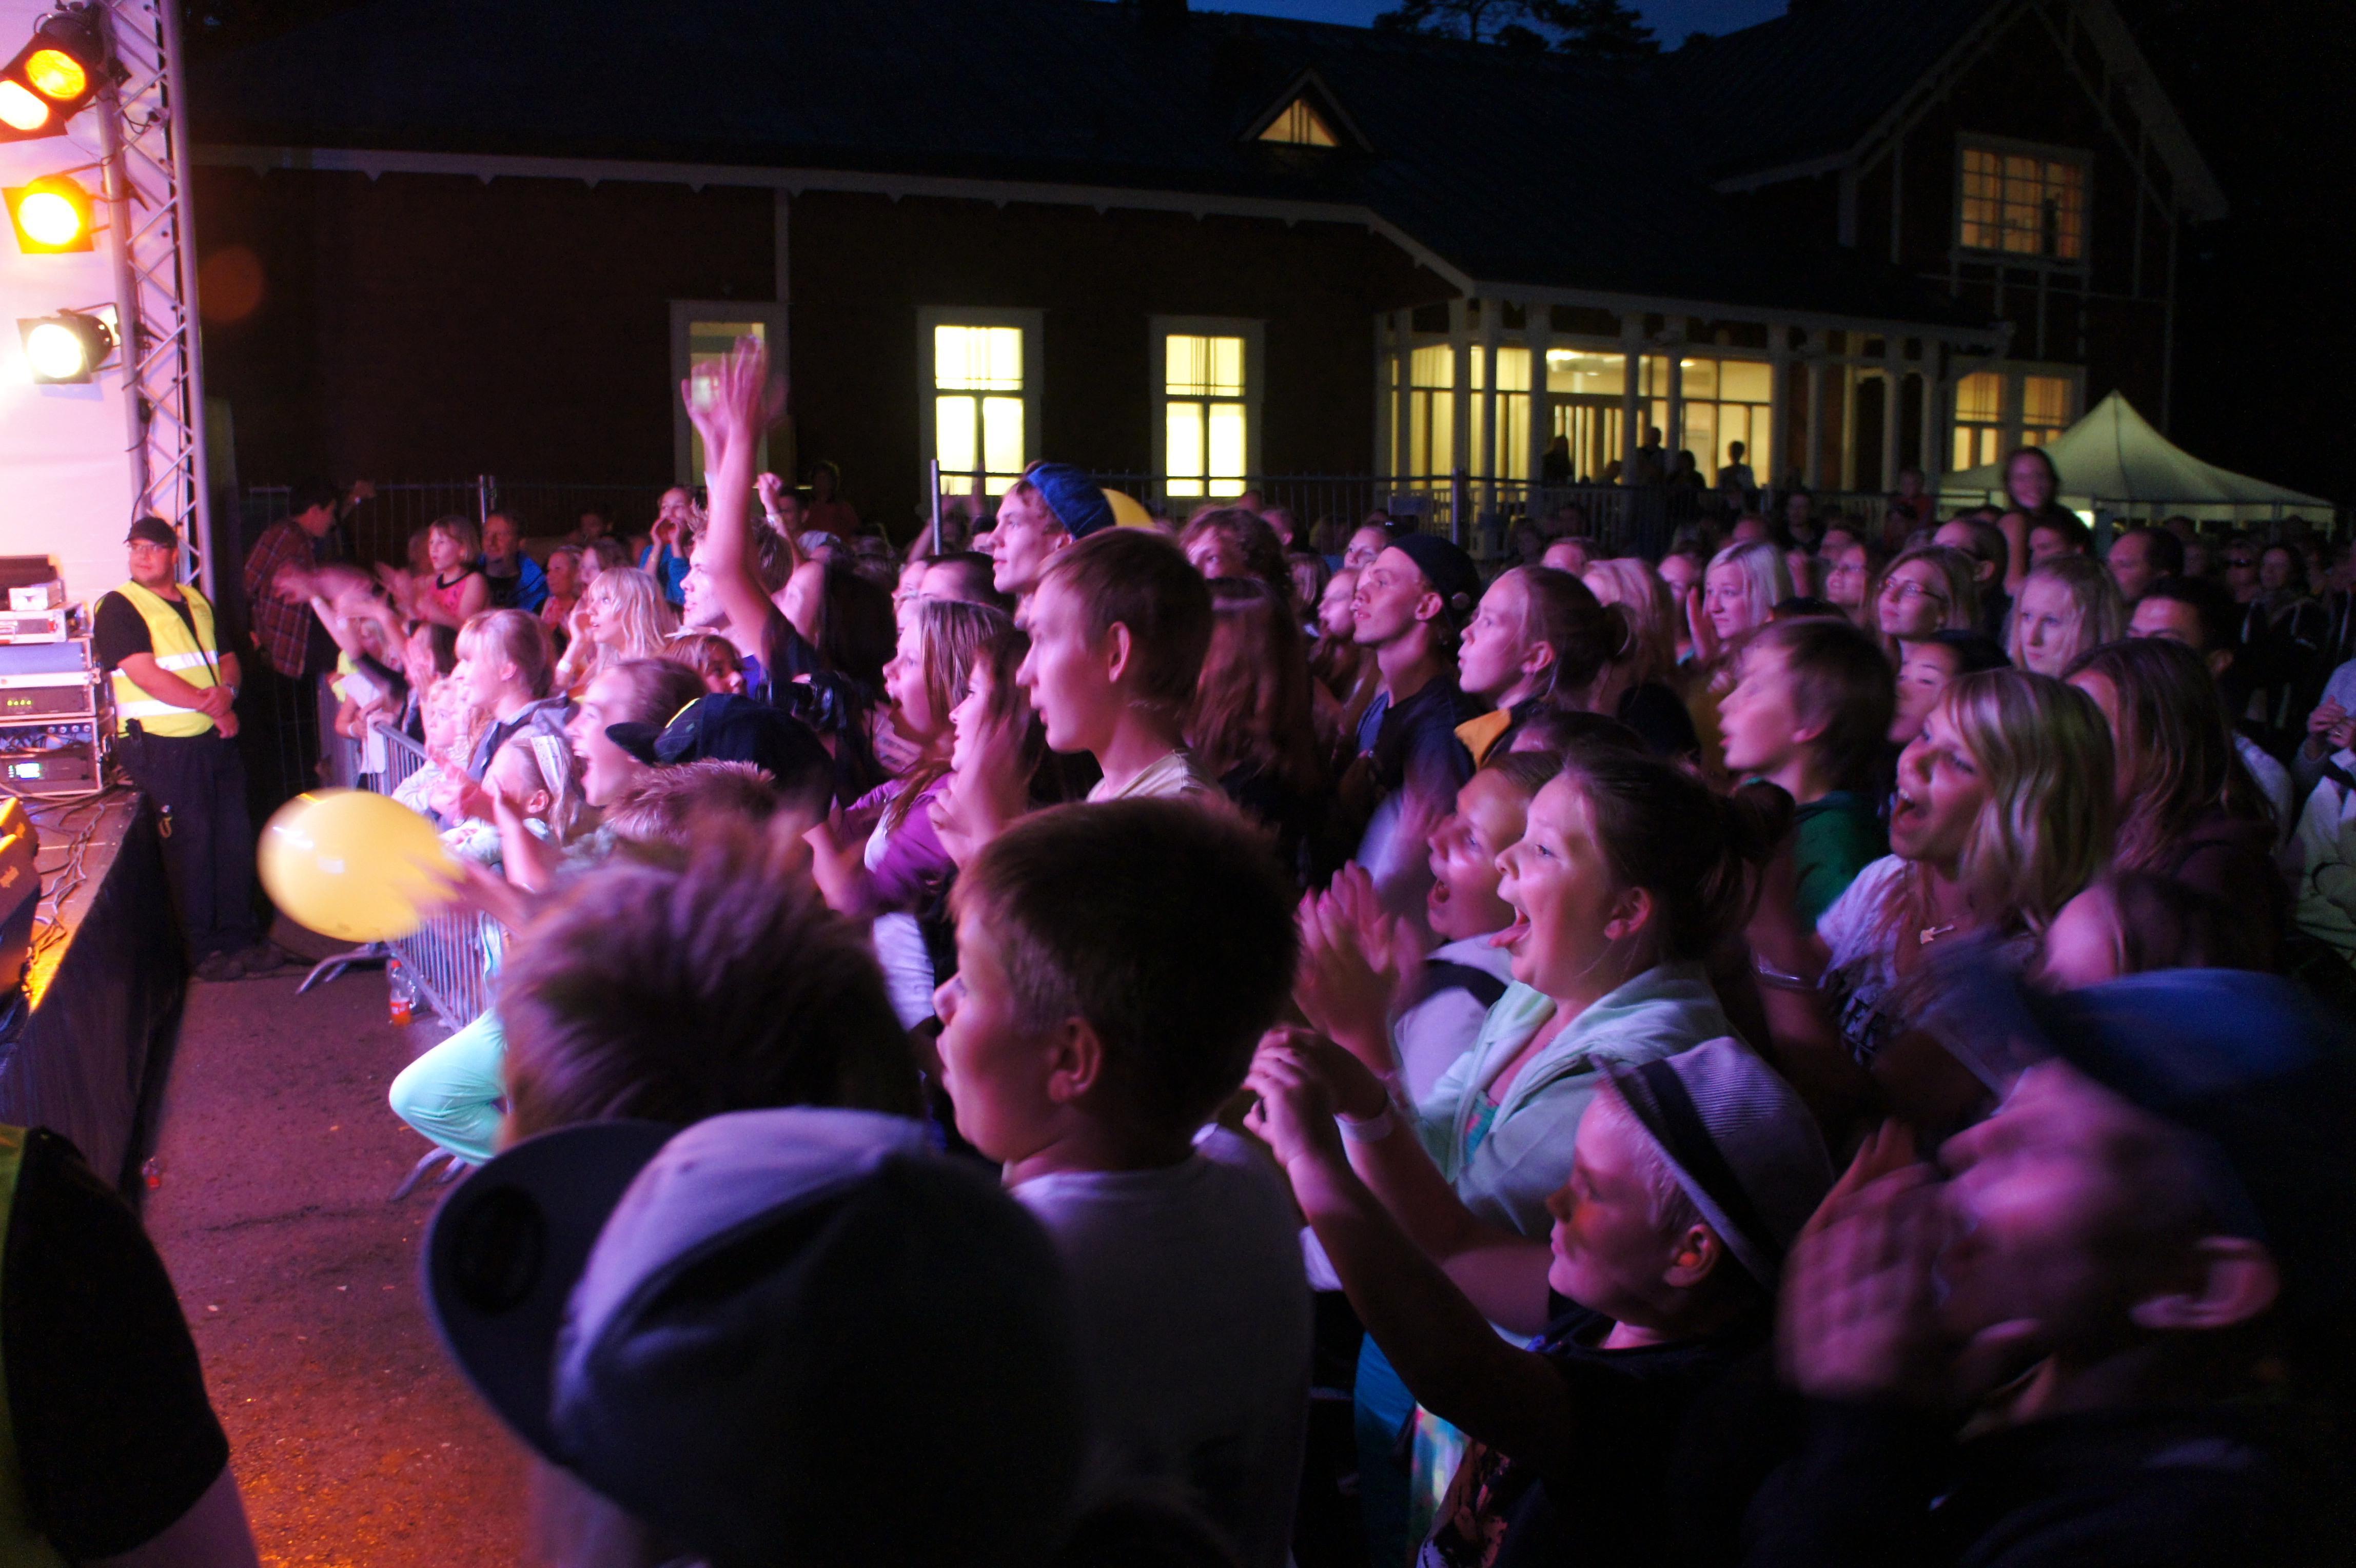 Nagu Rock crowd in 2013